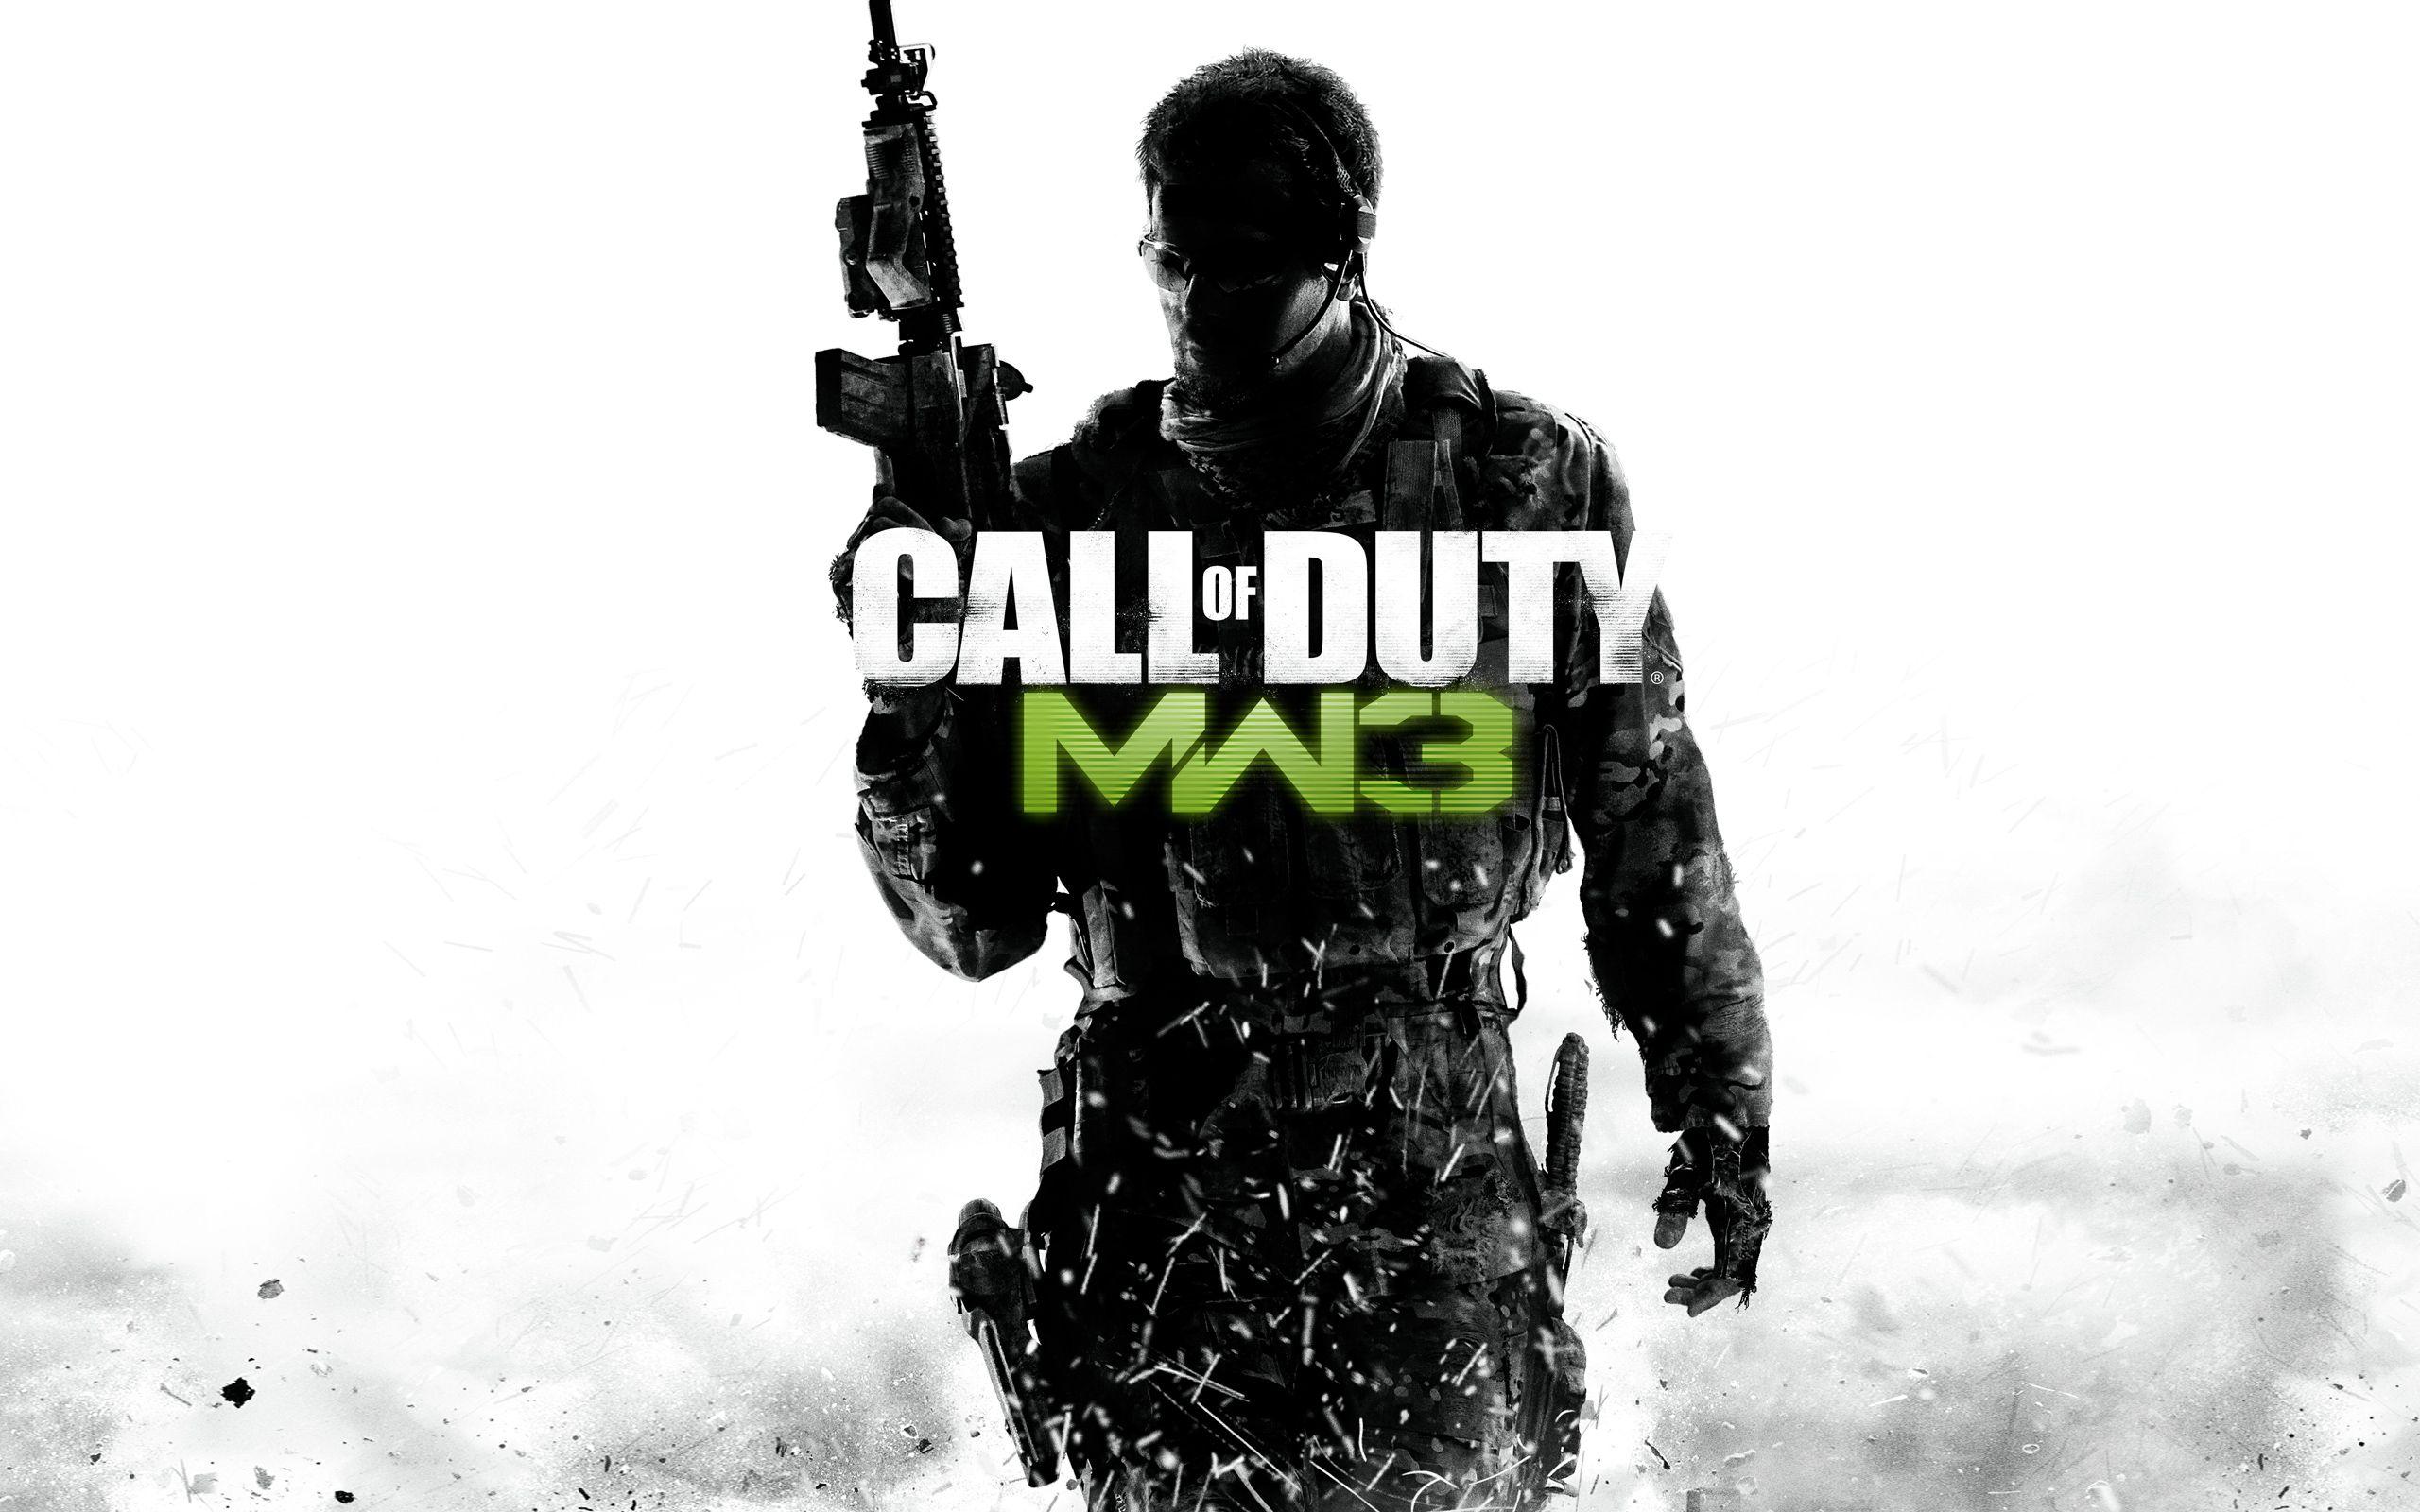 Call Of Duty Mw3 Call Of Duty Modern Warfare Video Game